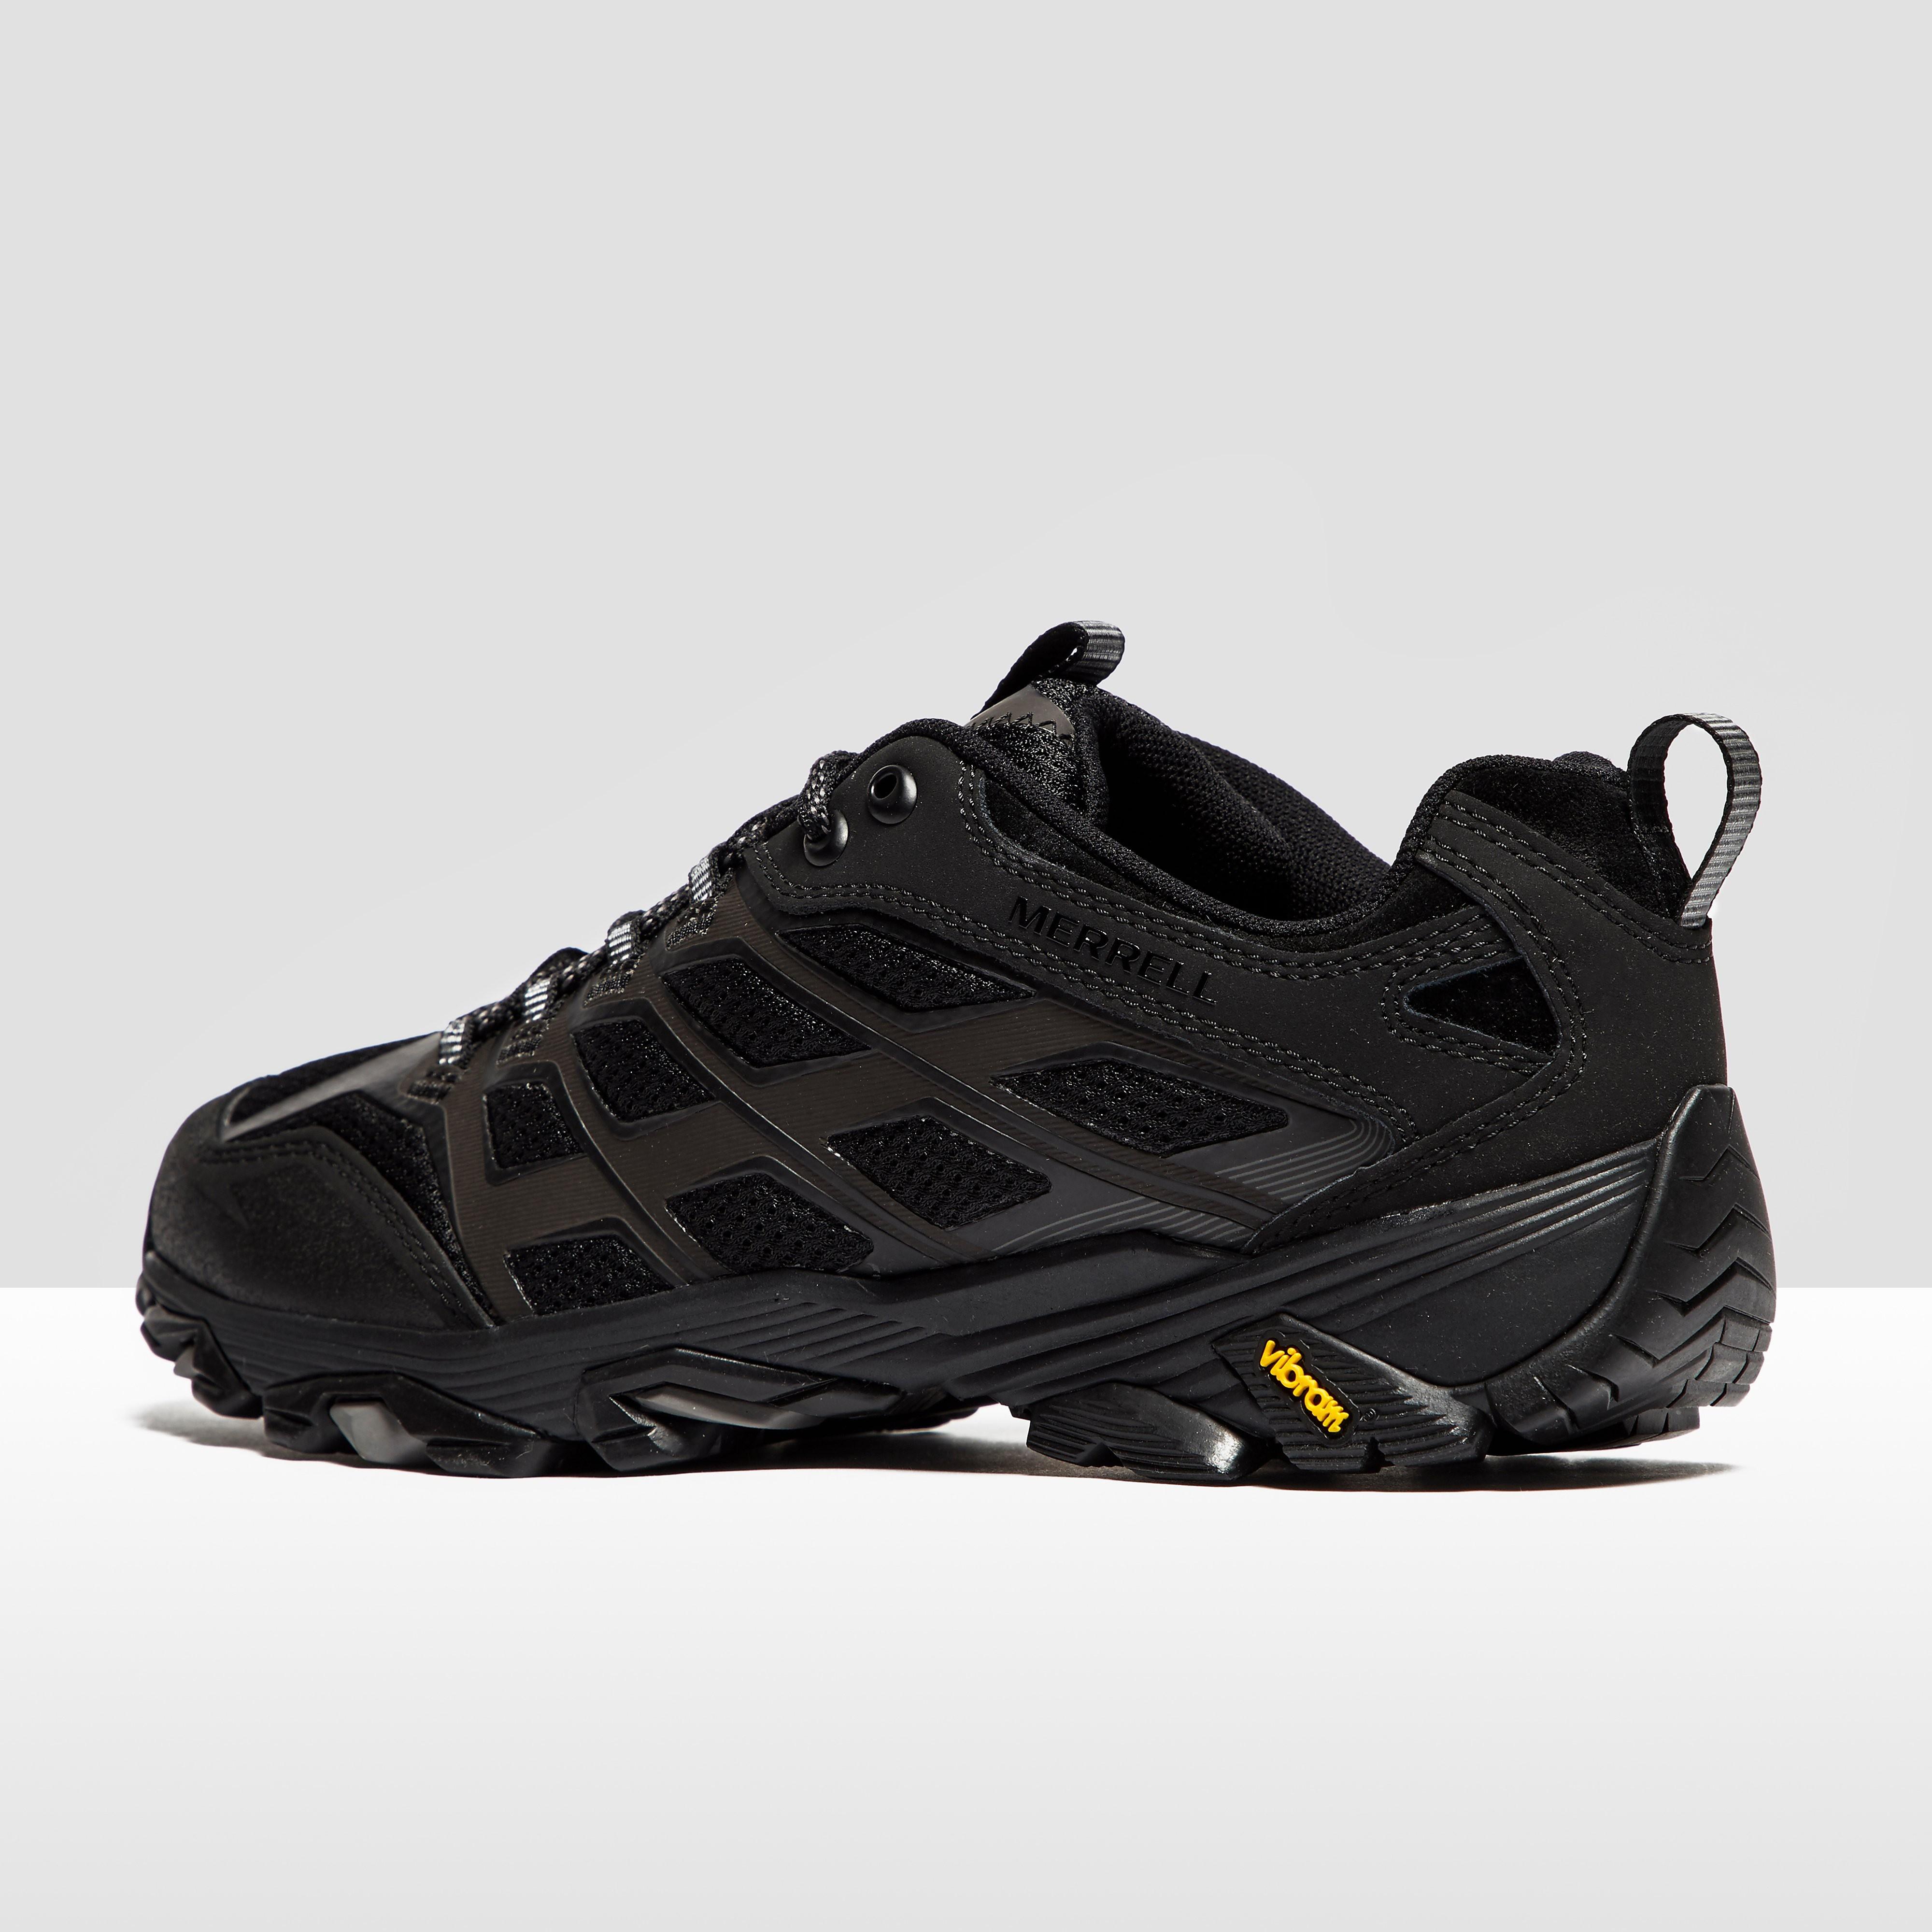 Merrell Moab FTS Men's Walking Shoes